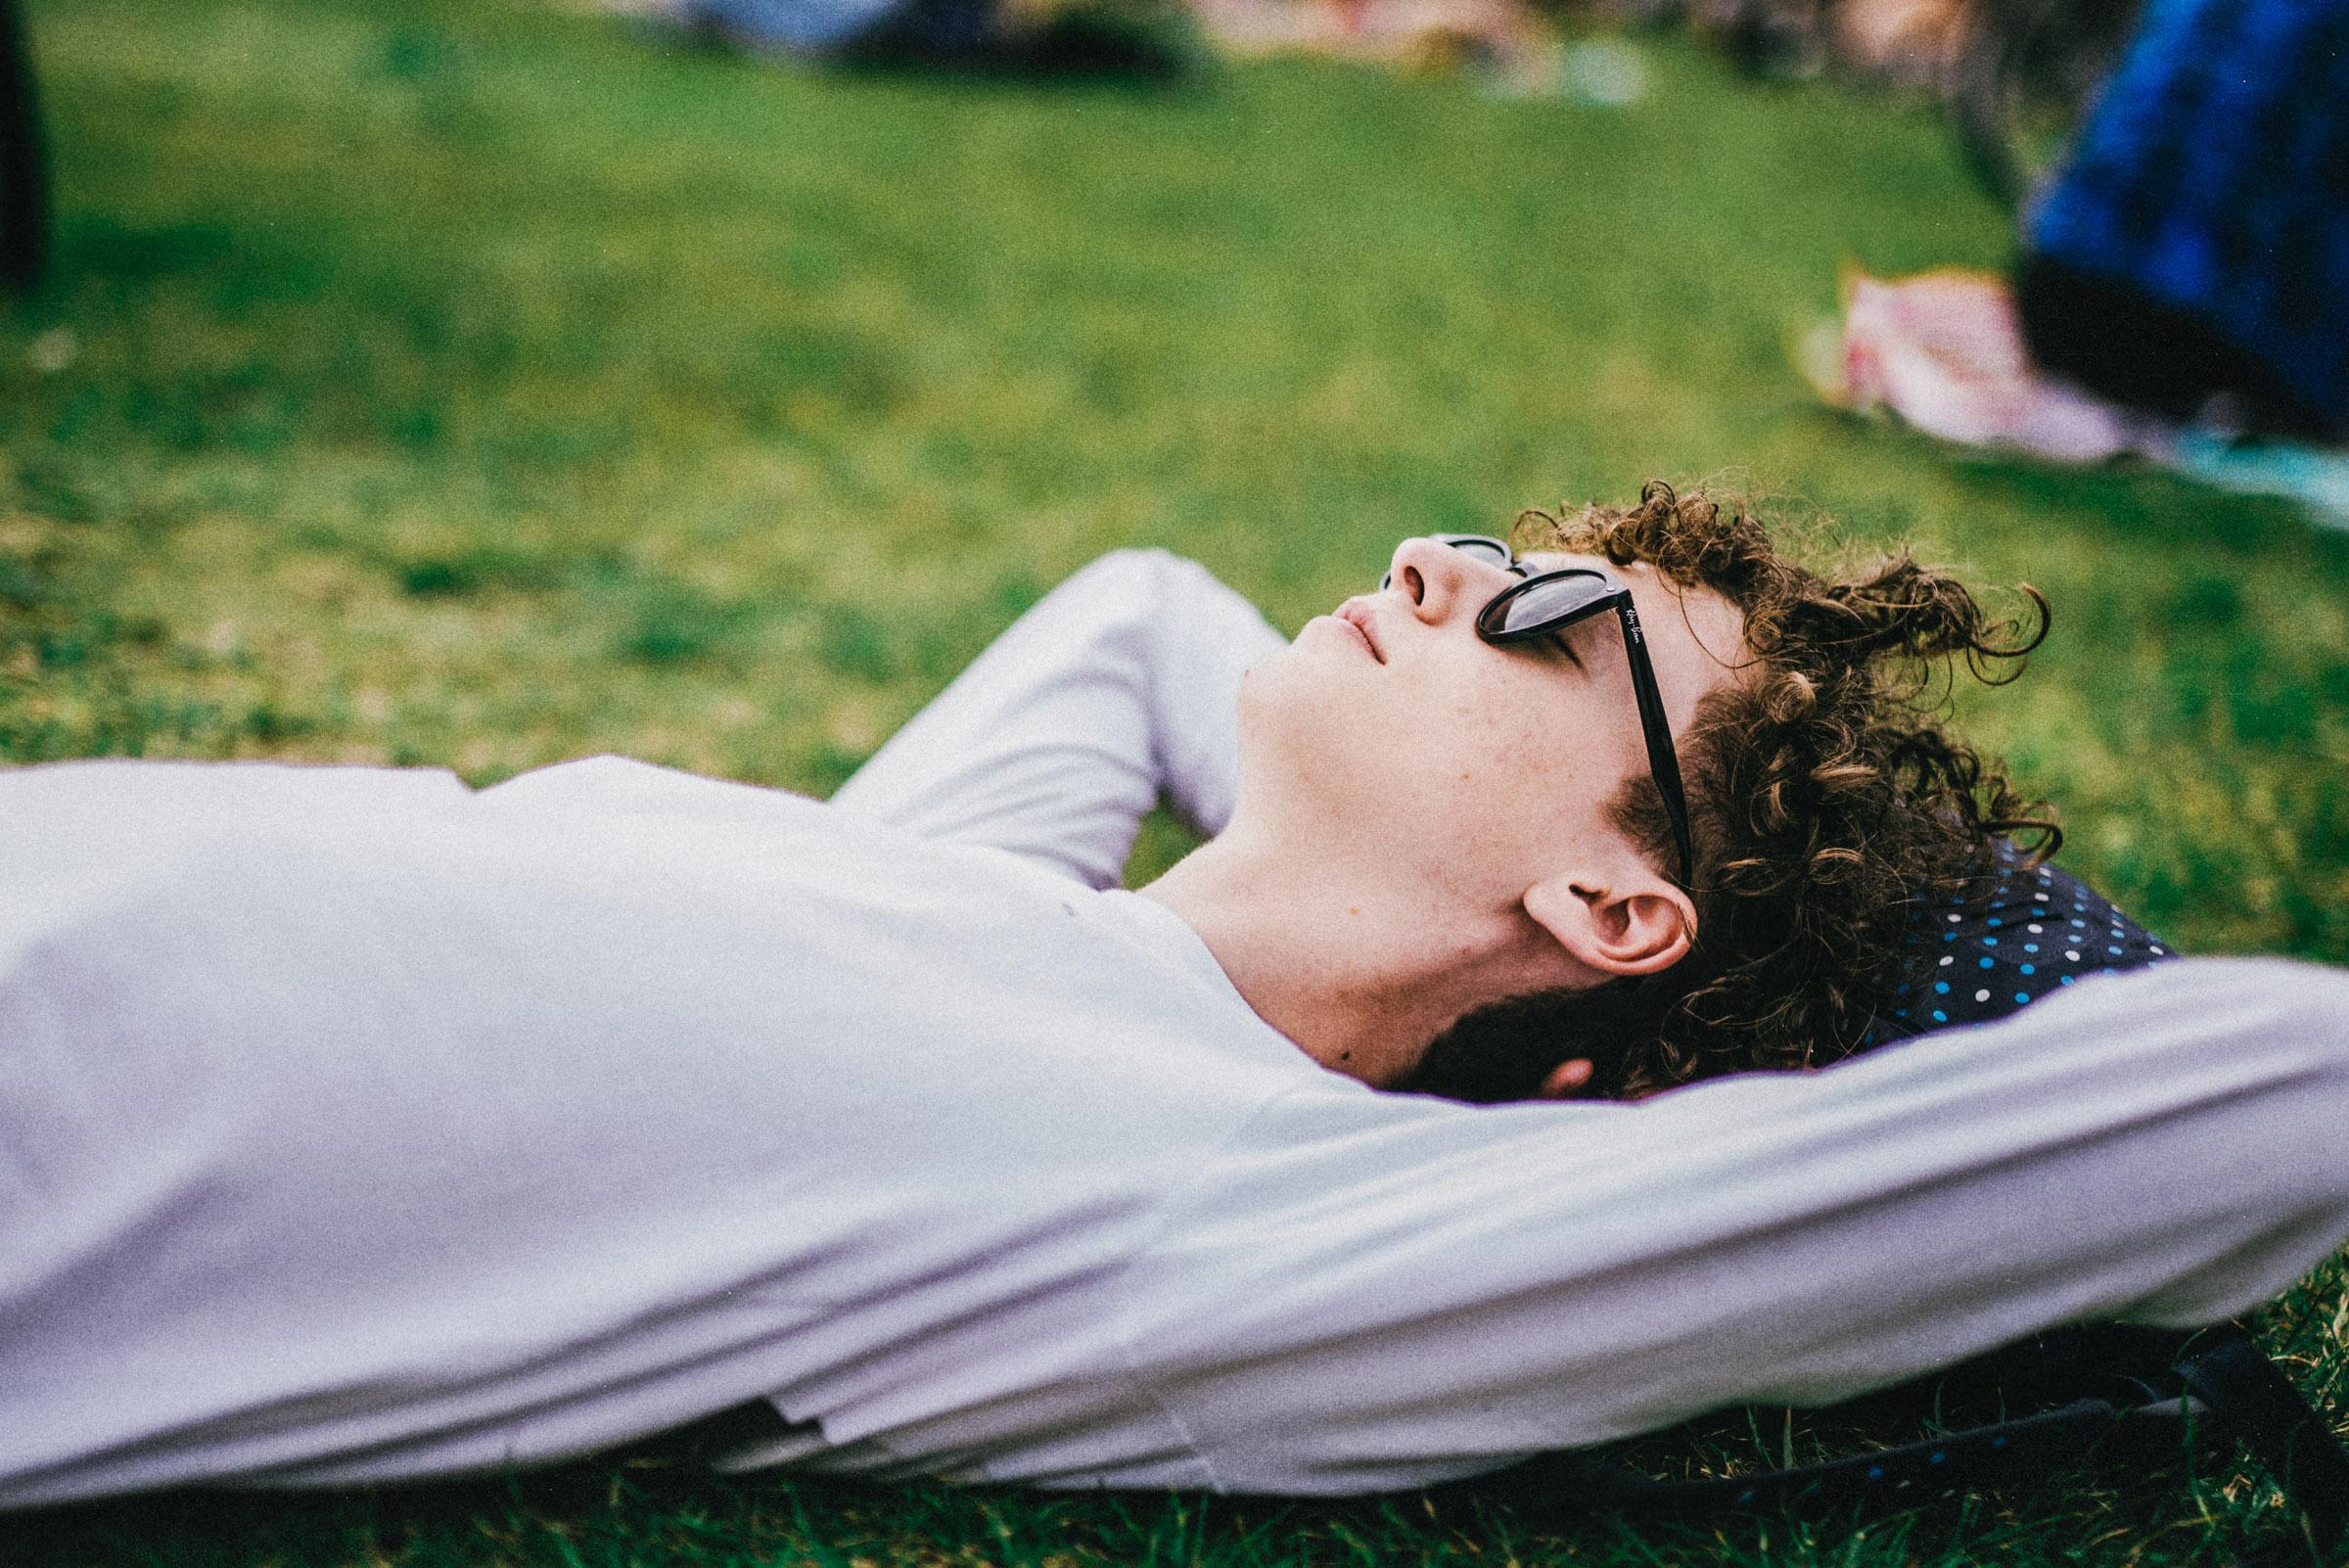 Guy in grass